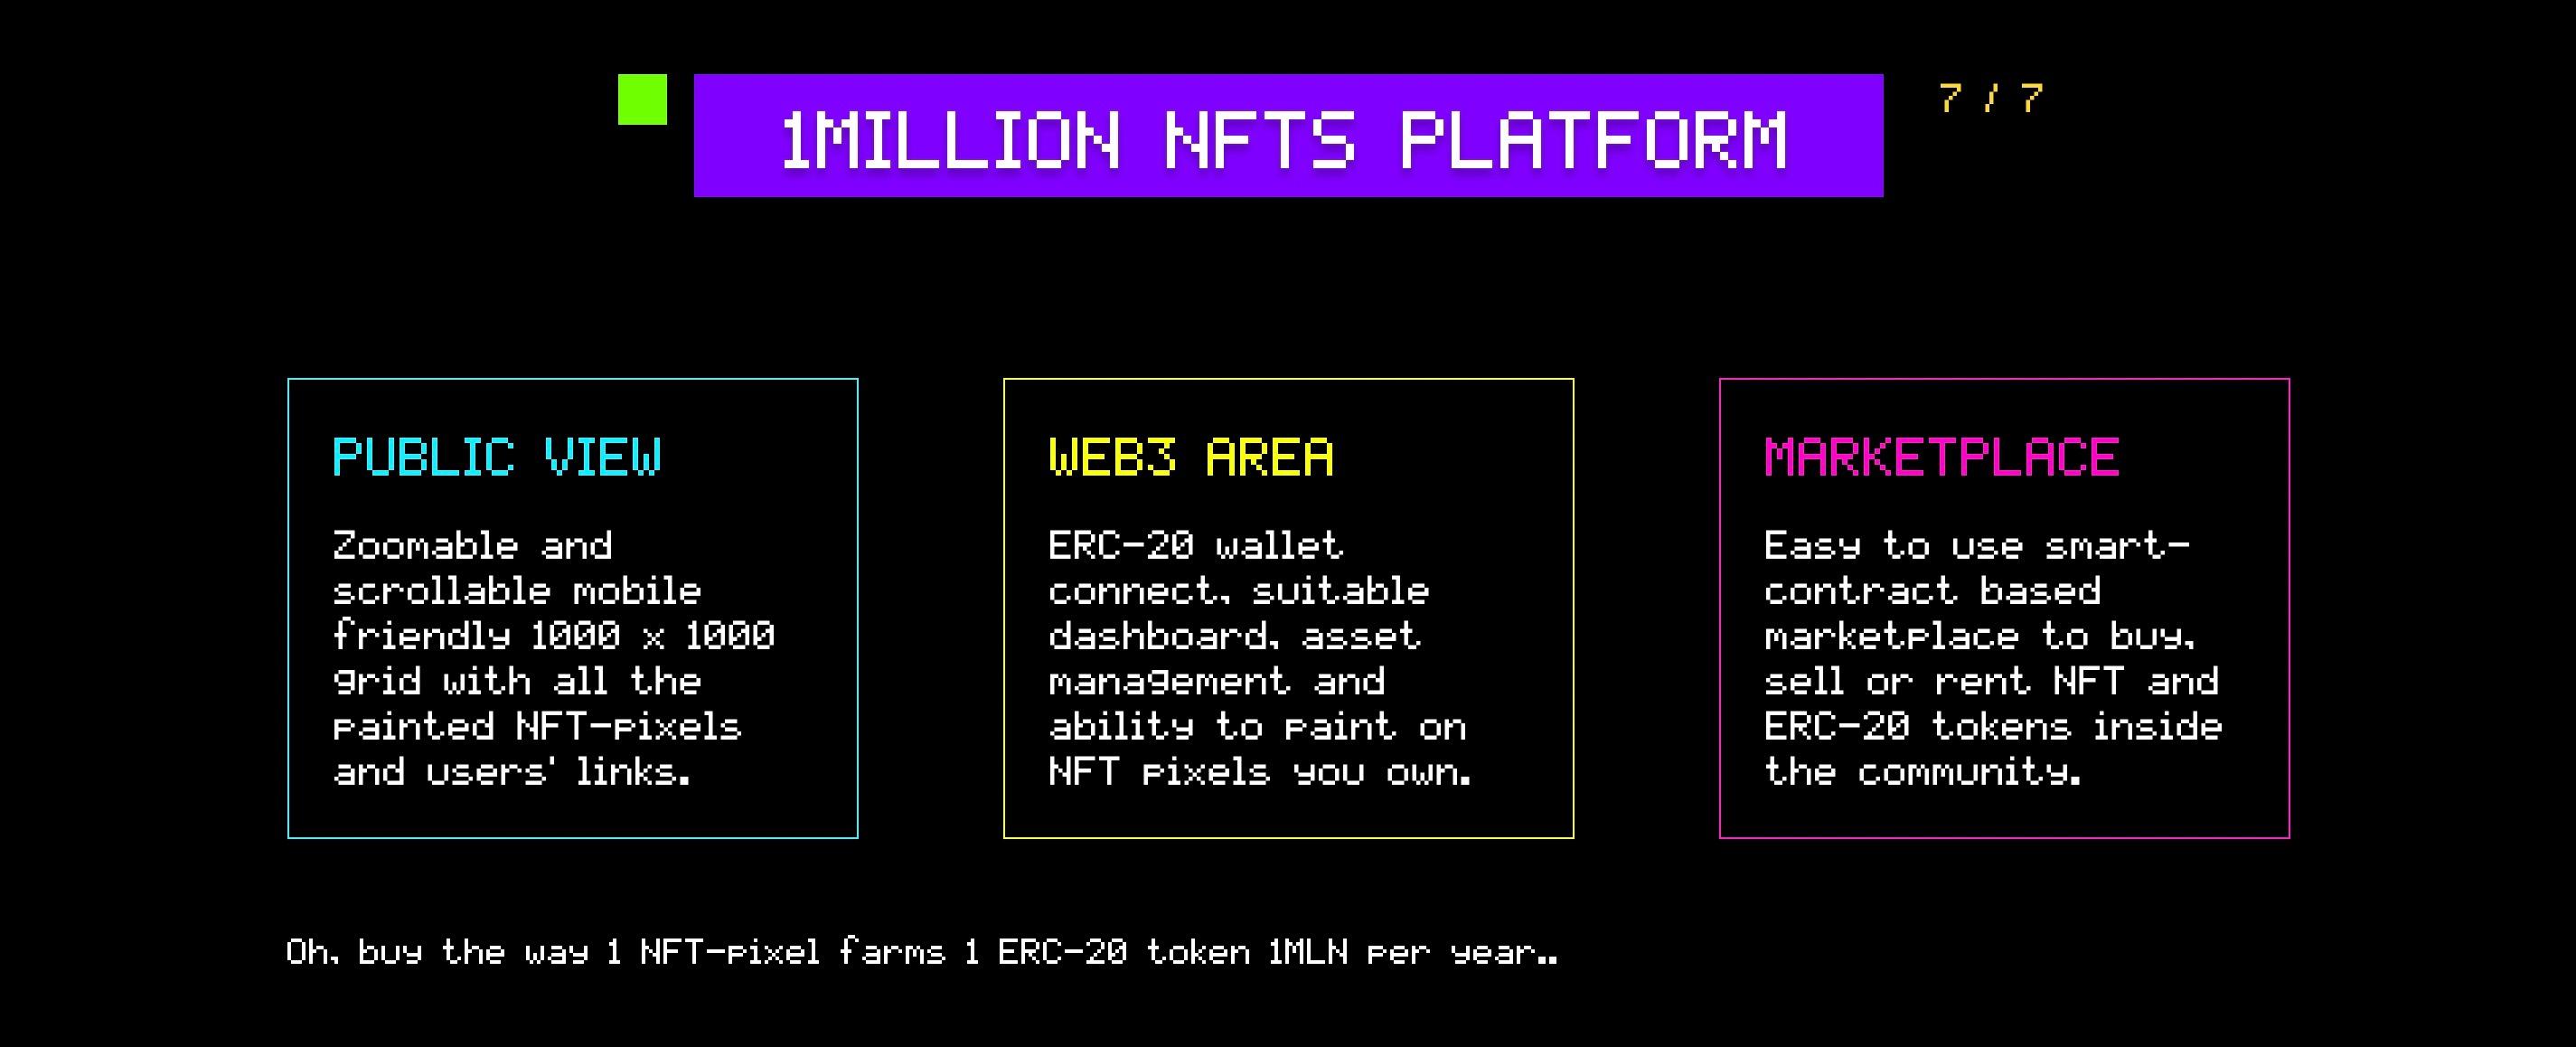 1 million nft platform